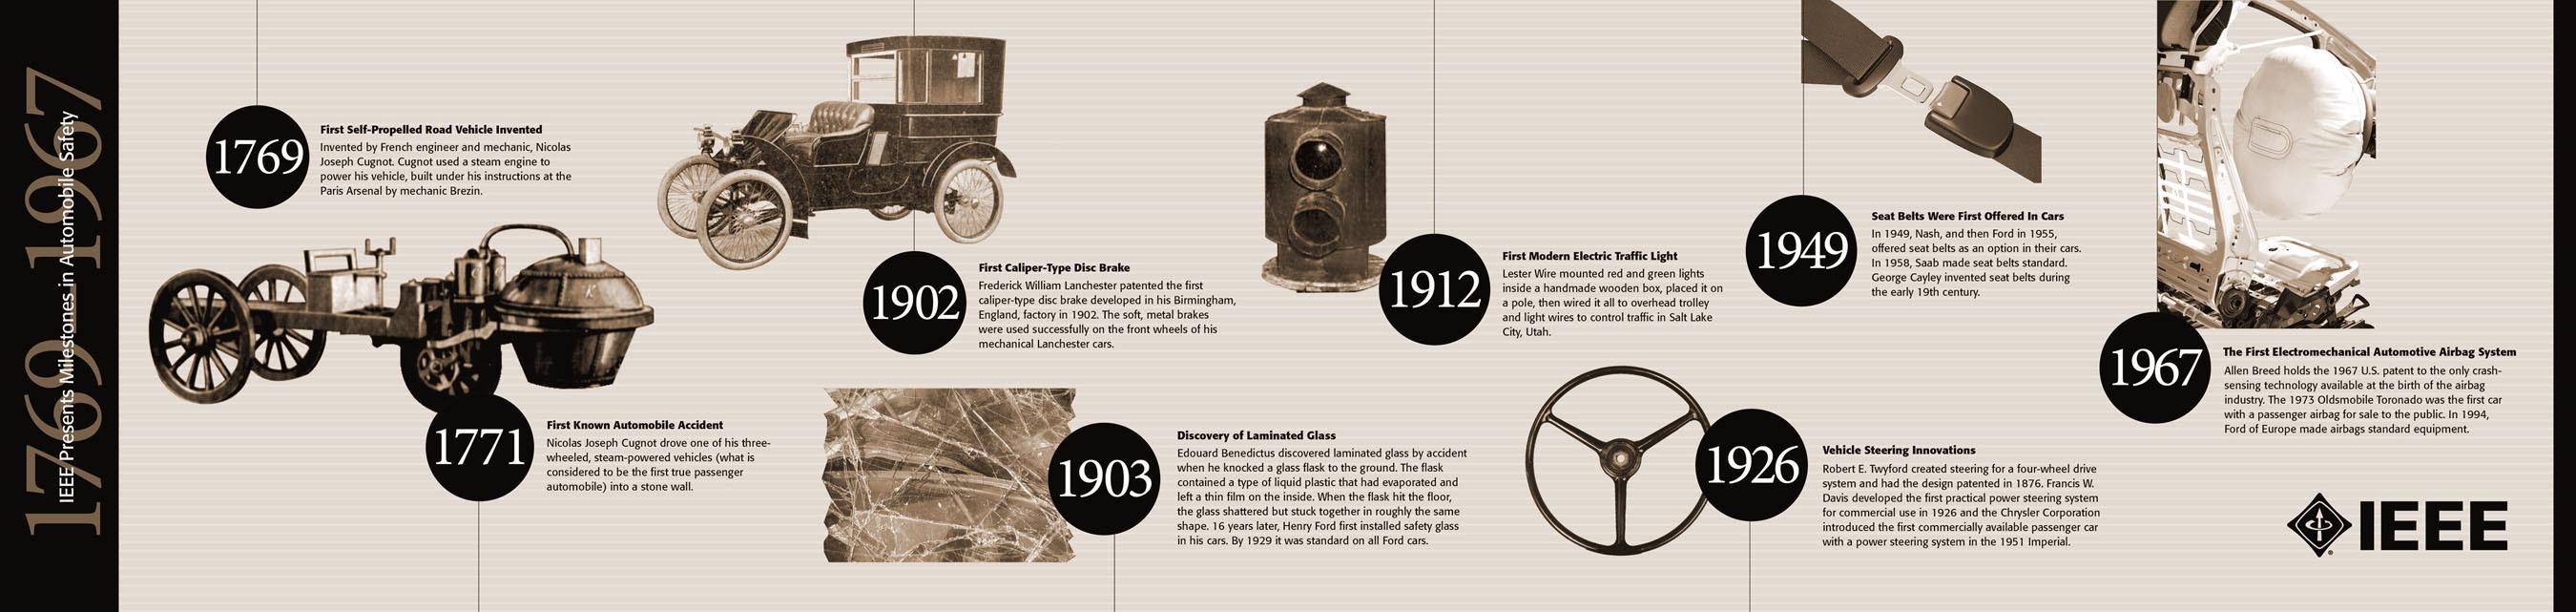 IEEE Presents Milestones in Automobile Safety.  (PRNewsFoto/IEEE)